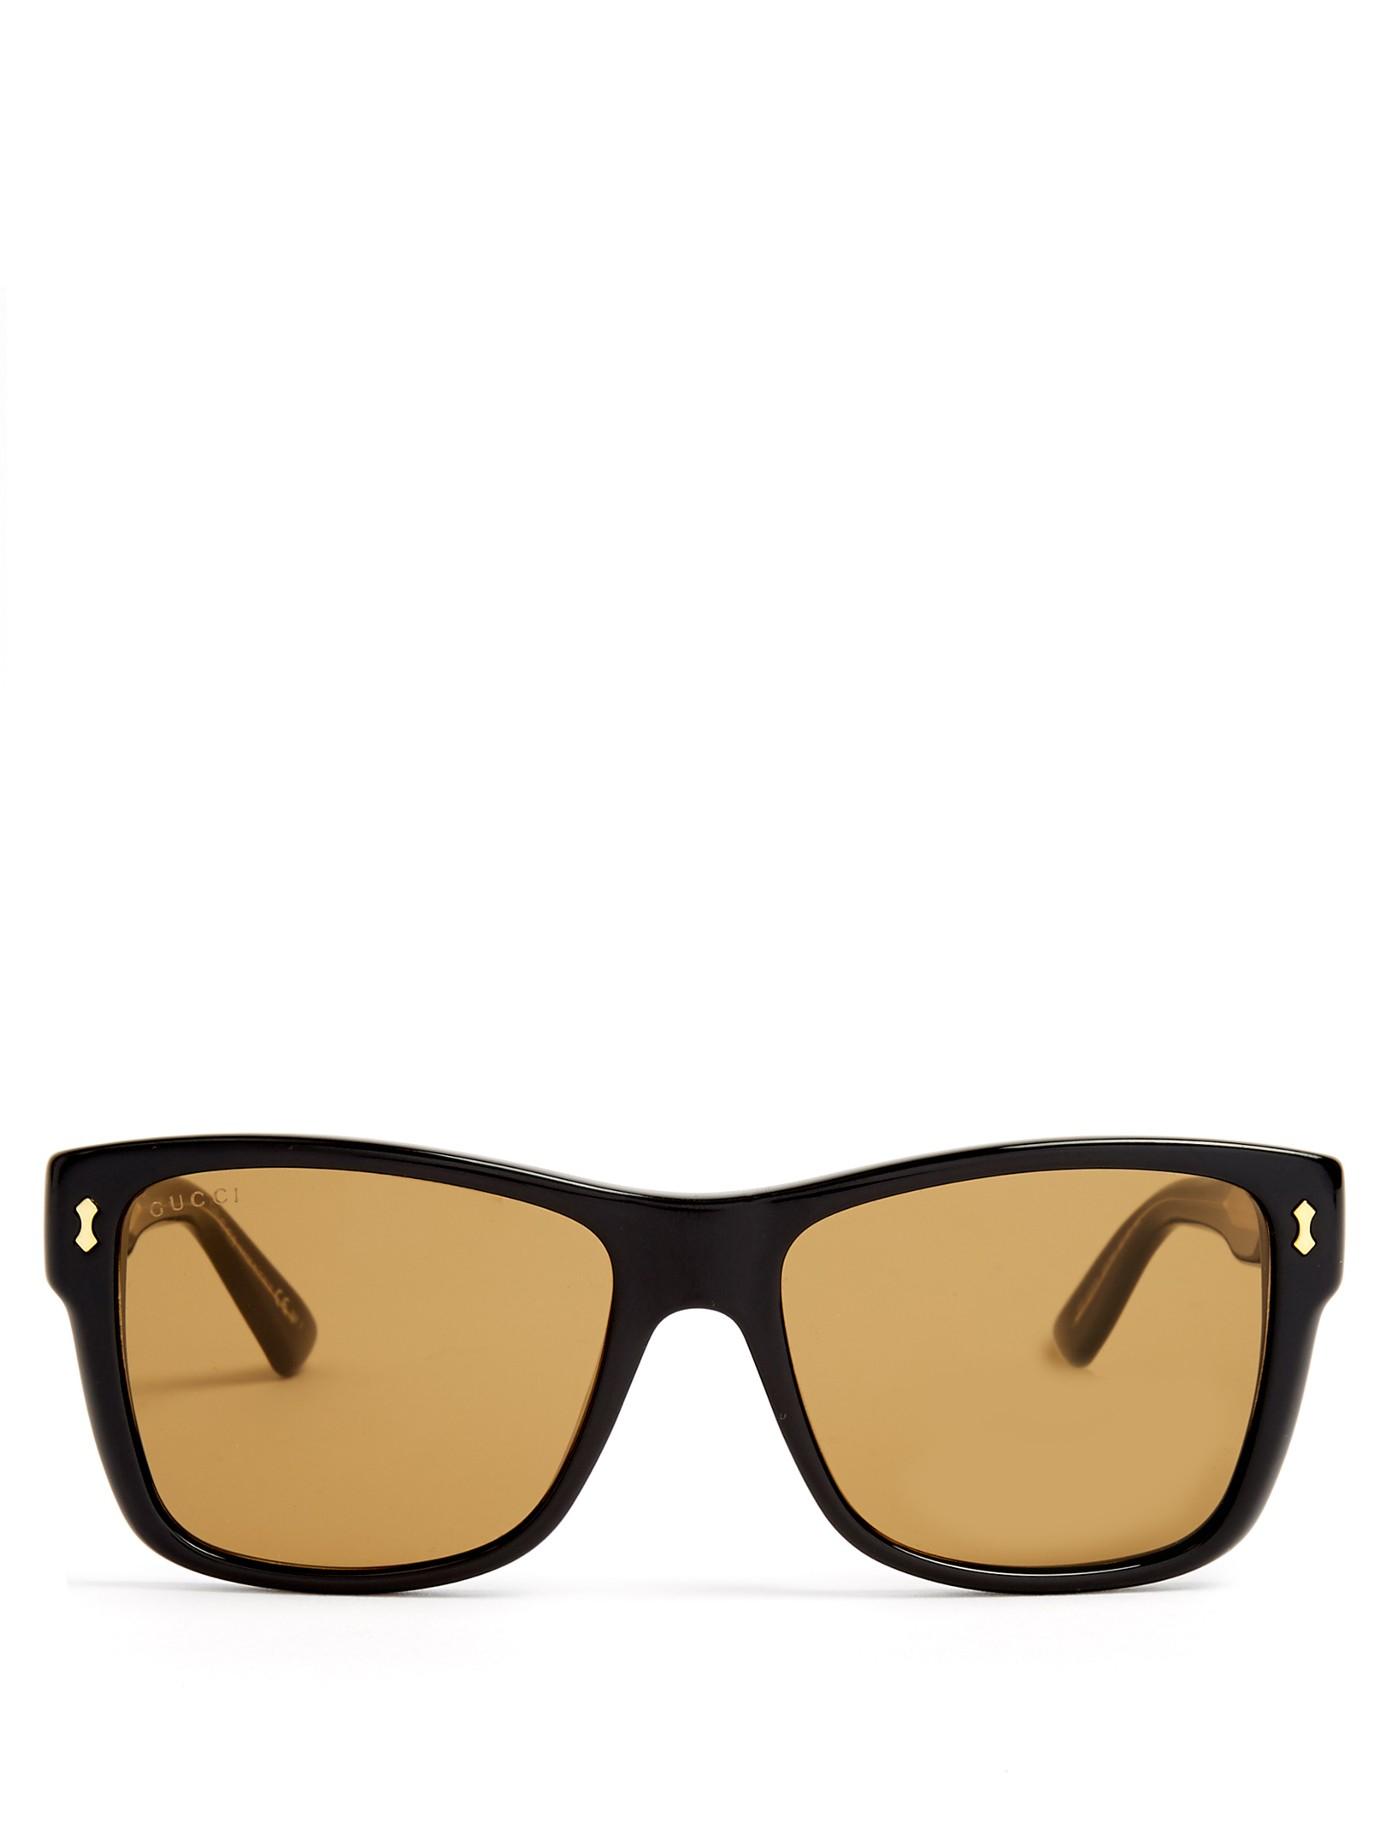 2b37ab3ece Lyst - Gucci Rectangular-frame Acetate Sunglasses in Black for Men